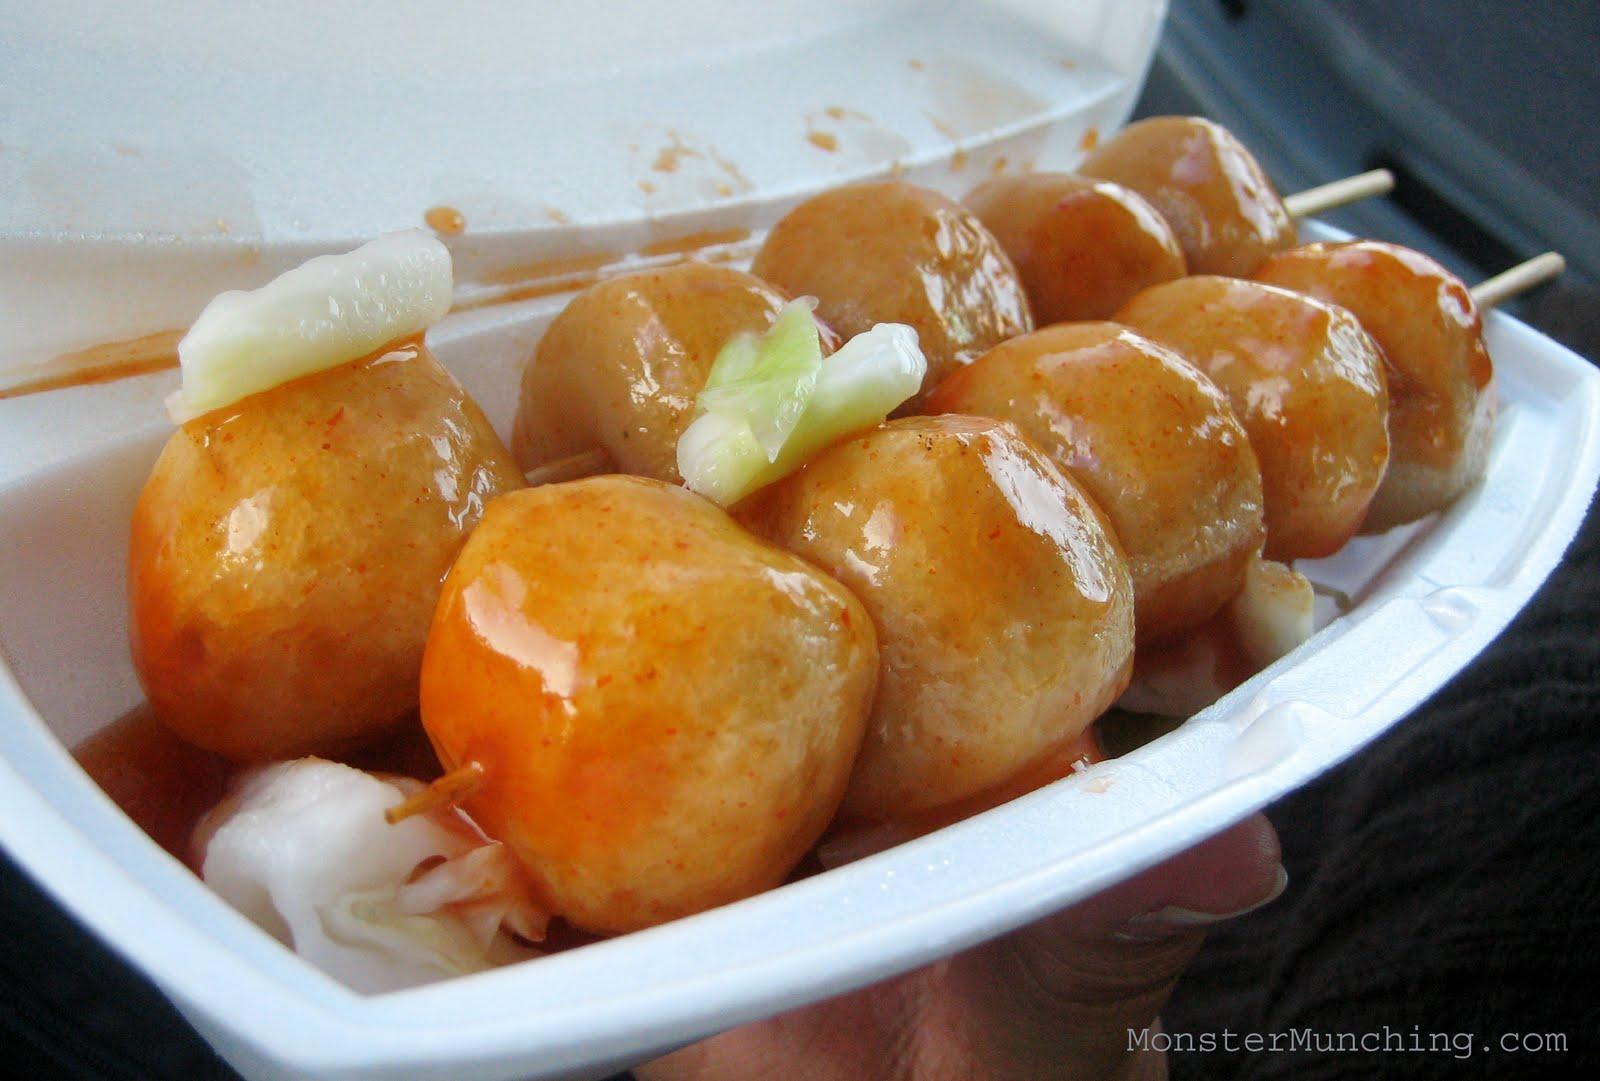 Monster munching hong kong fishball house 39 s fishballs on for Chinese fish balls